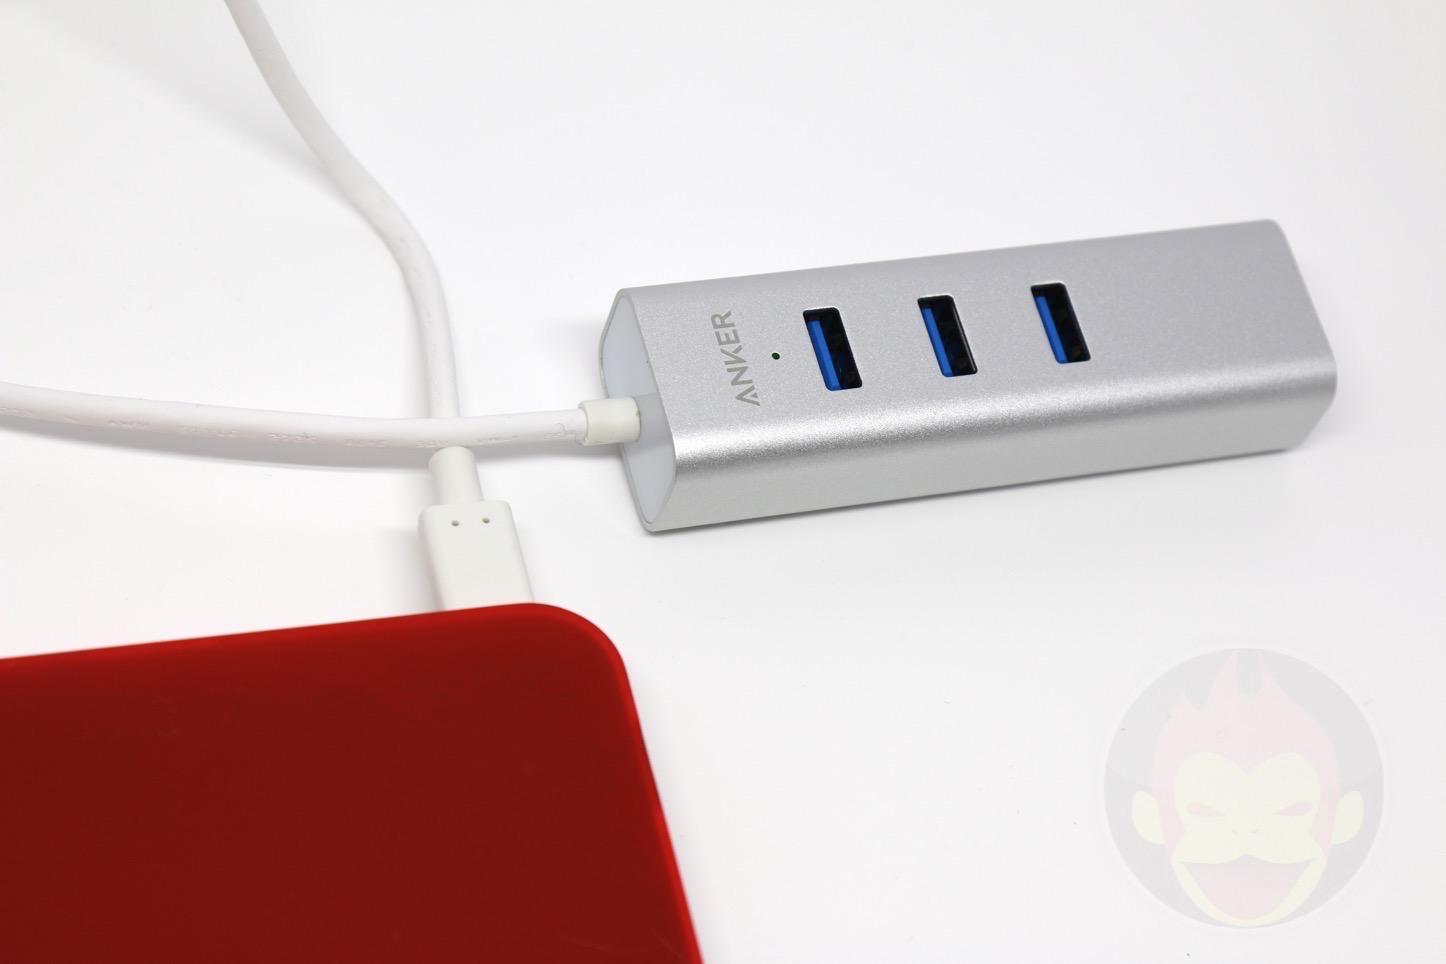 Anker USB-C 3ポート USB3.0イーサネットアダプター付ハブ USB